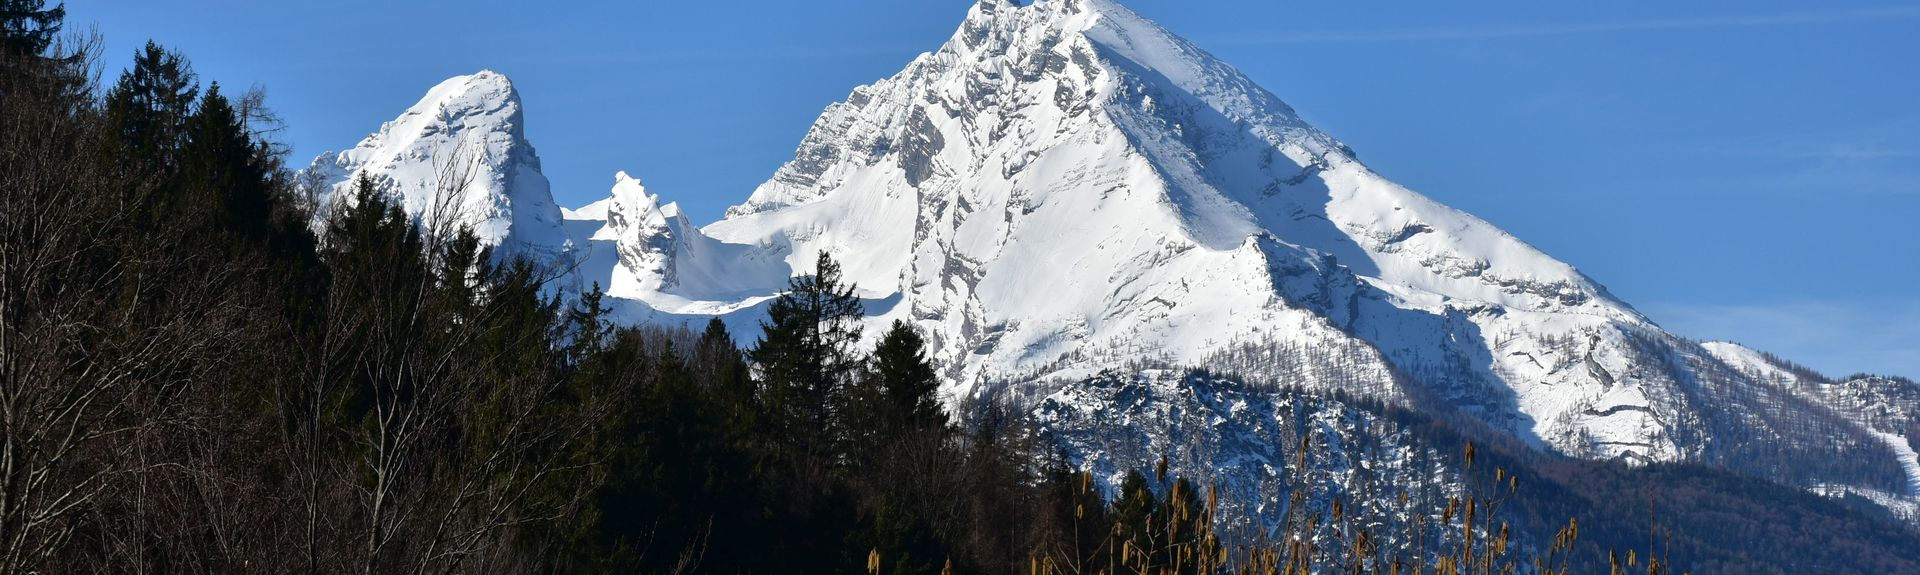 Anzenbach, Berchtesgaden, Baijeri, Saksa